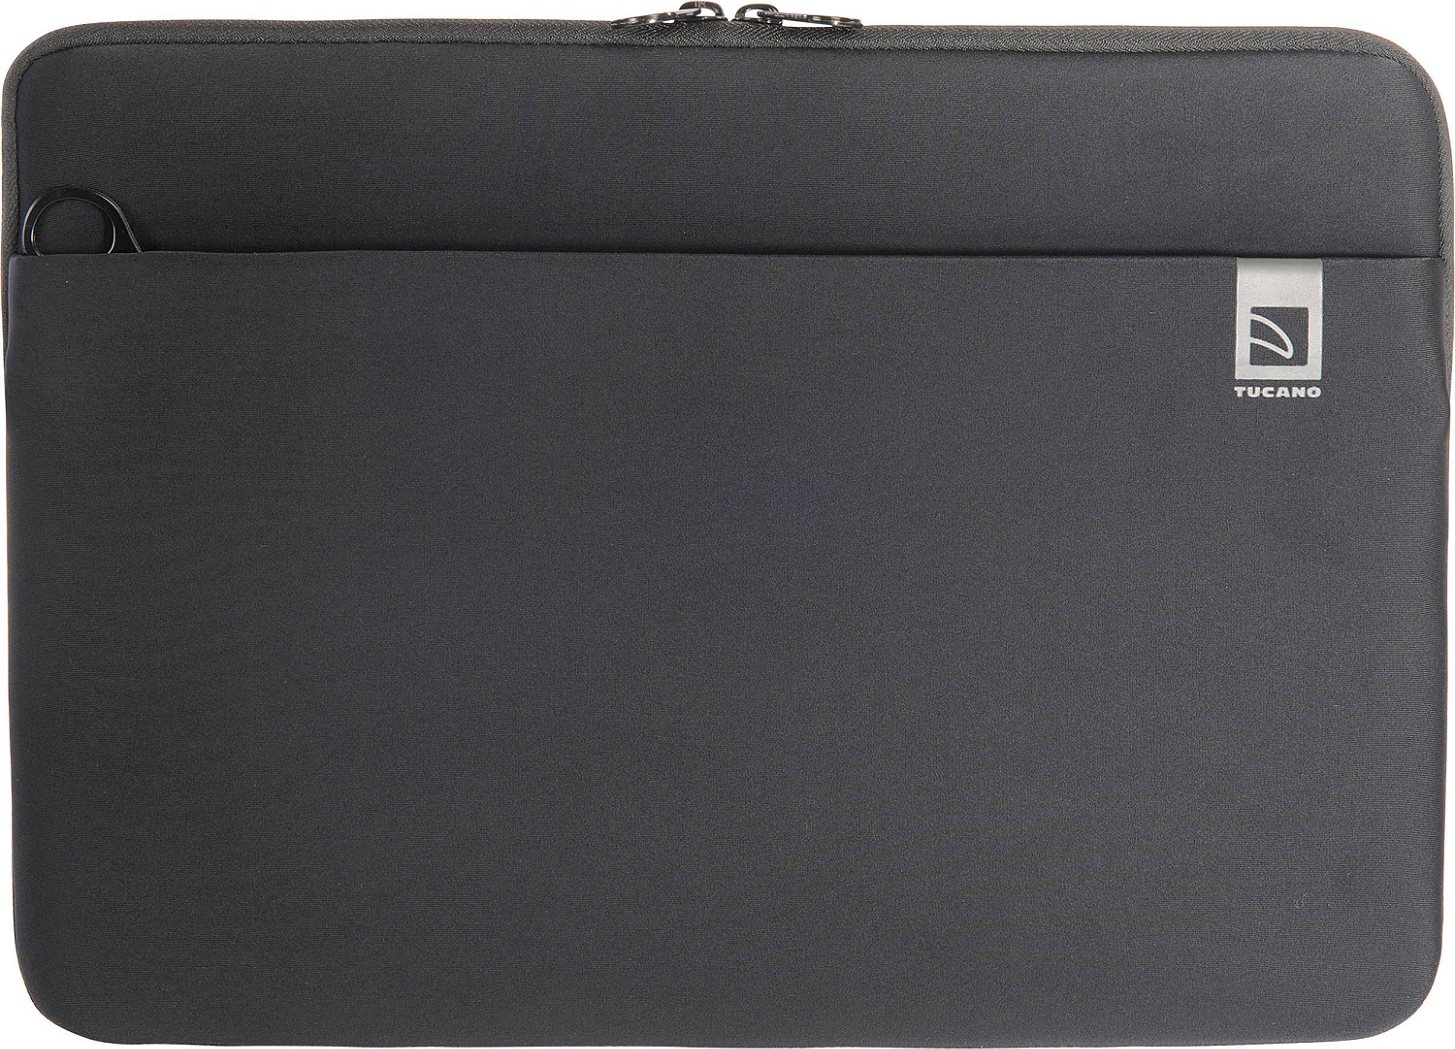 1585b99c62 TUCANO Borsa notebook 15 porta pc Custodia MacBook Pro Retina Neoprene  BFTMB15BK